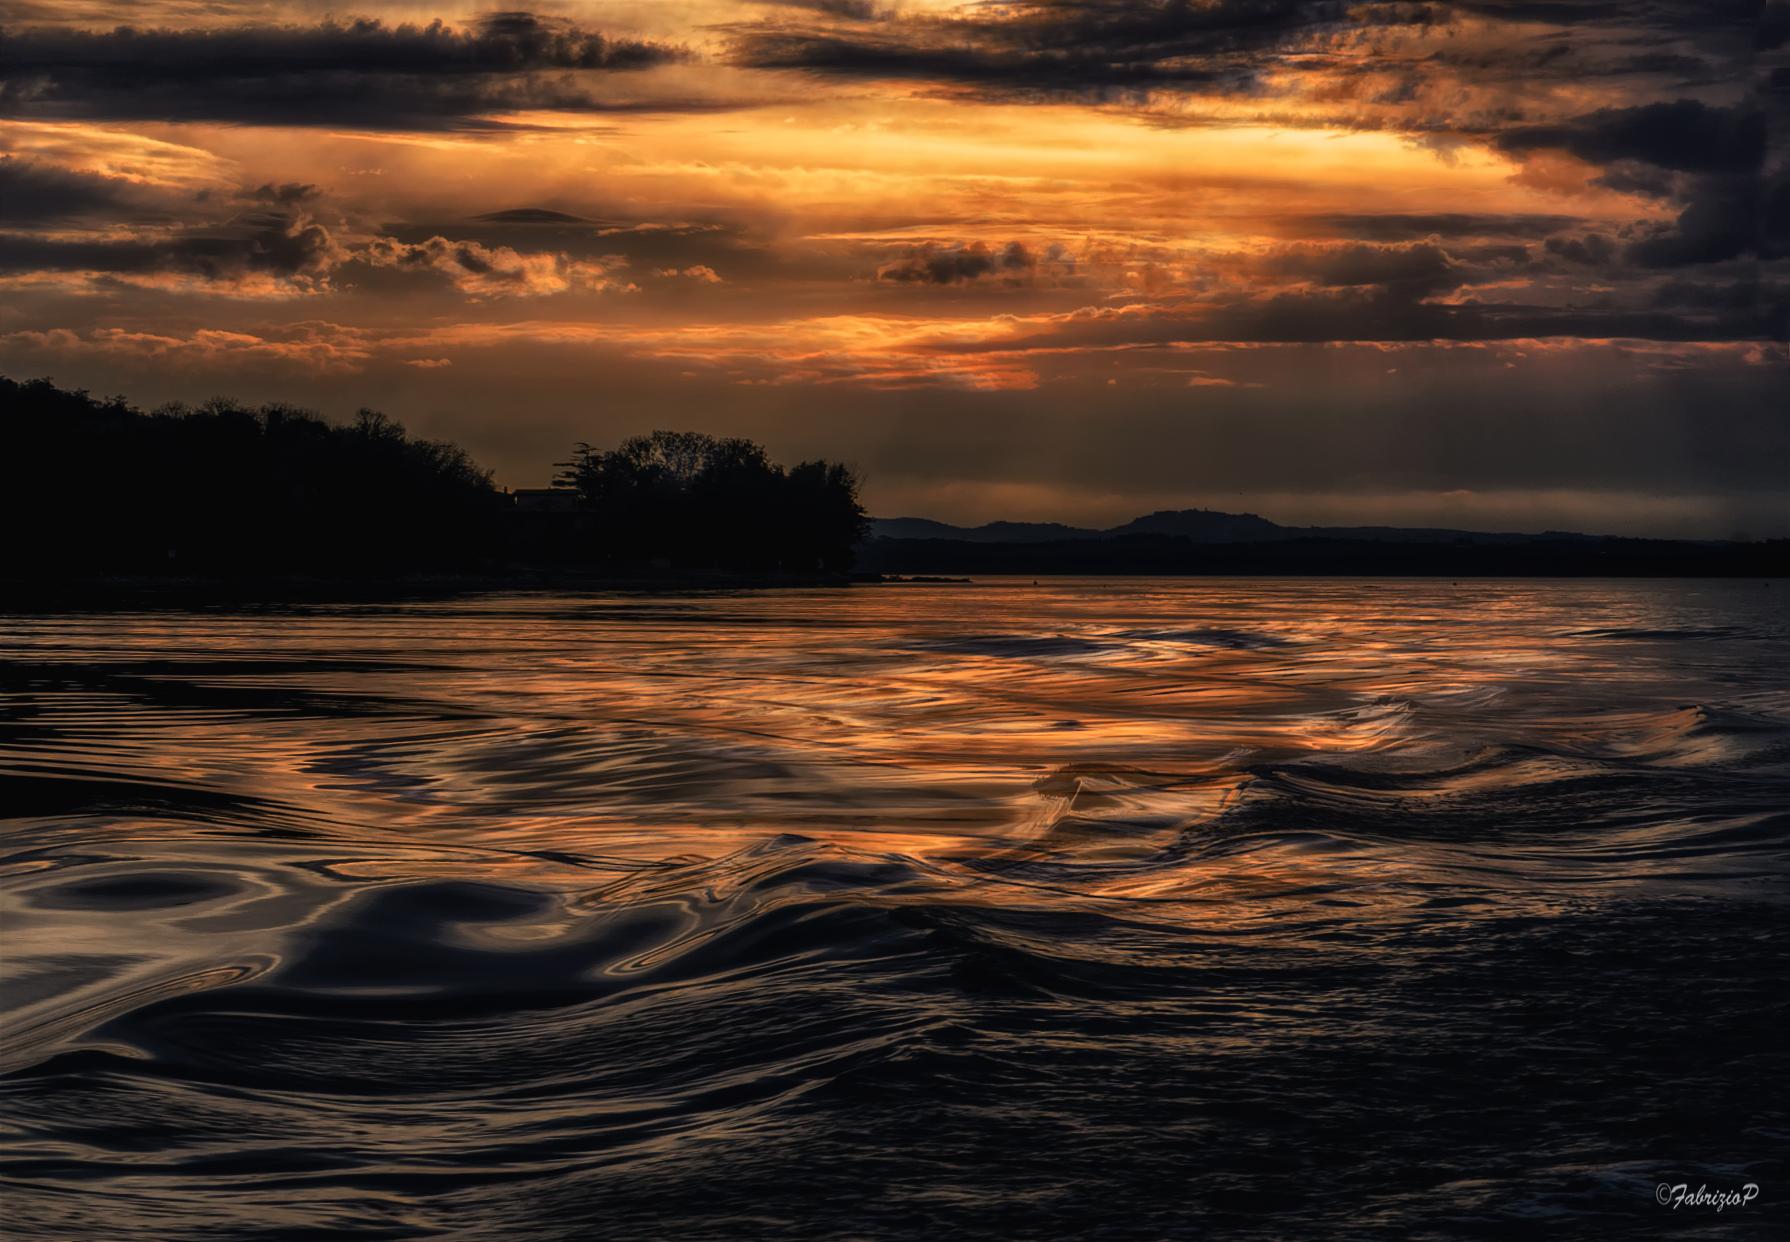 The last light on the lake ...